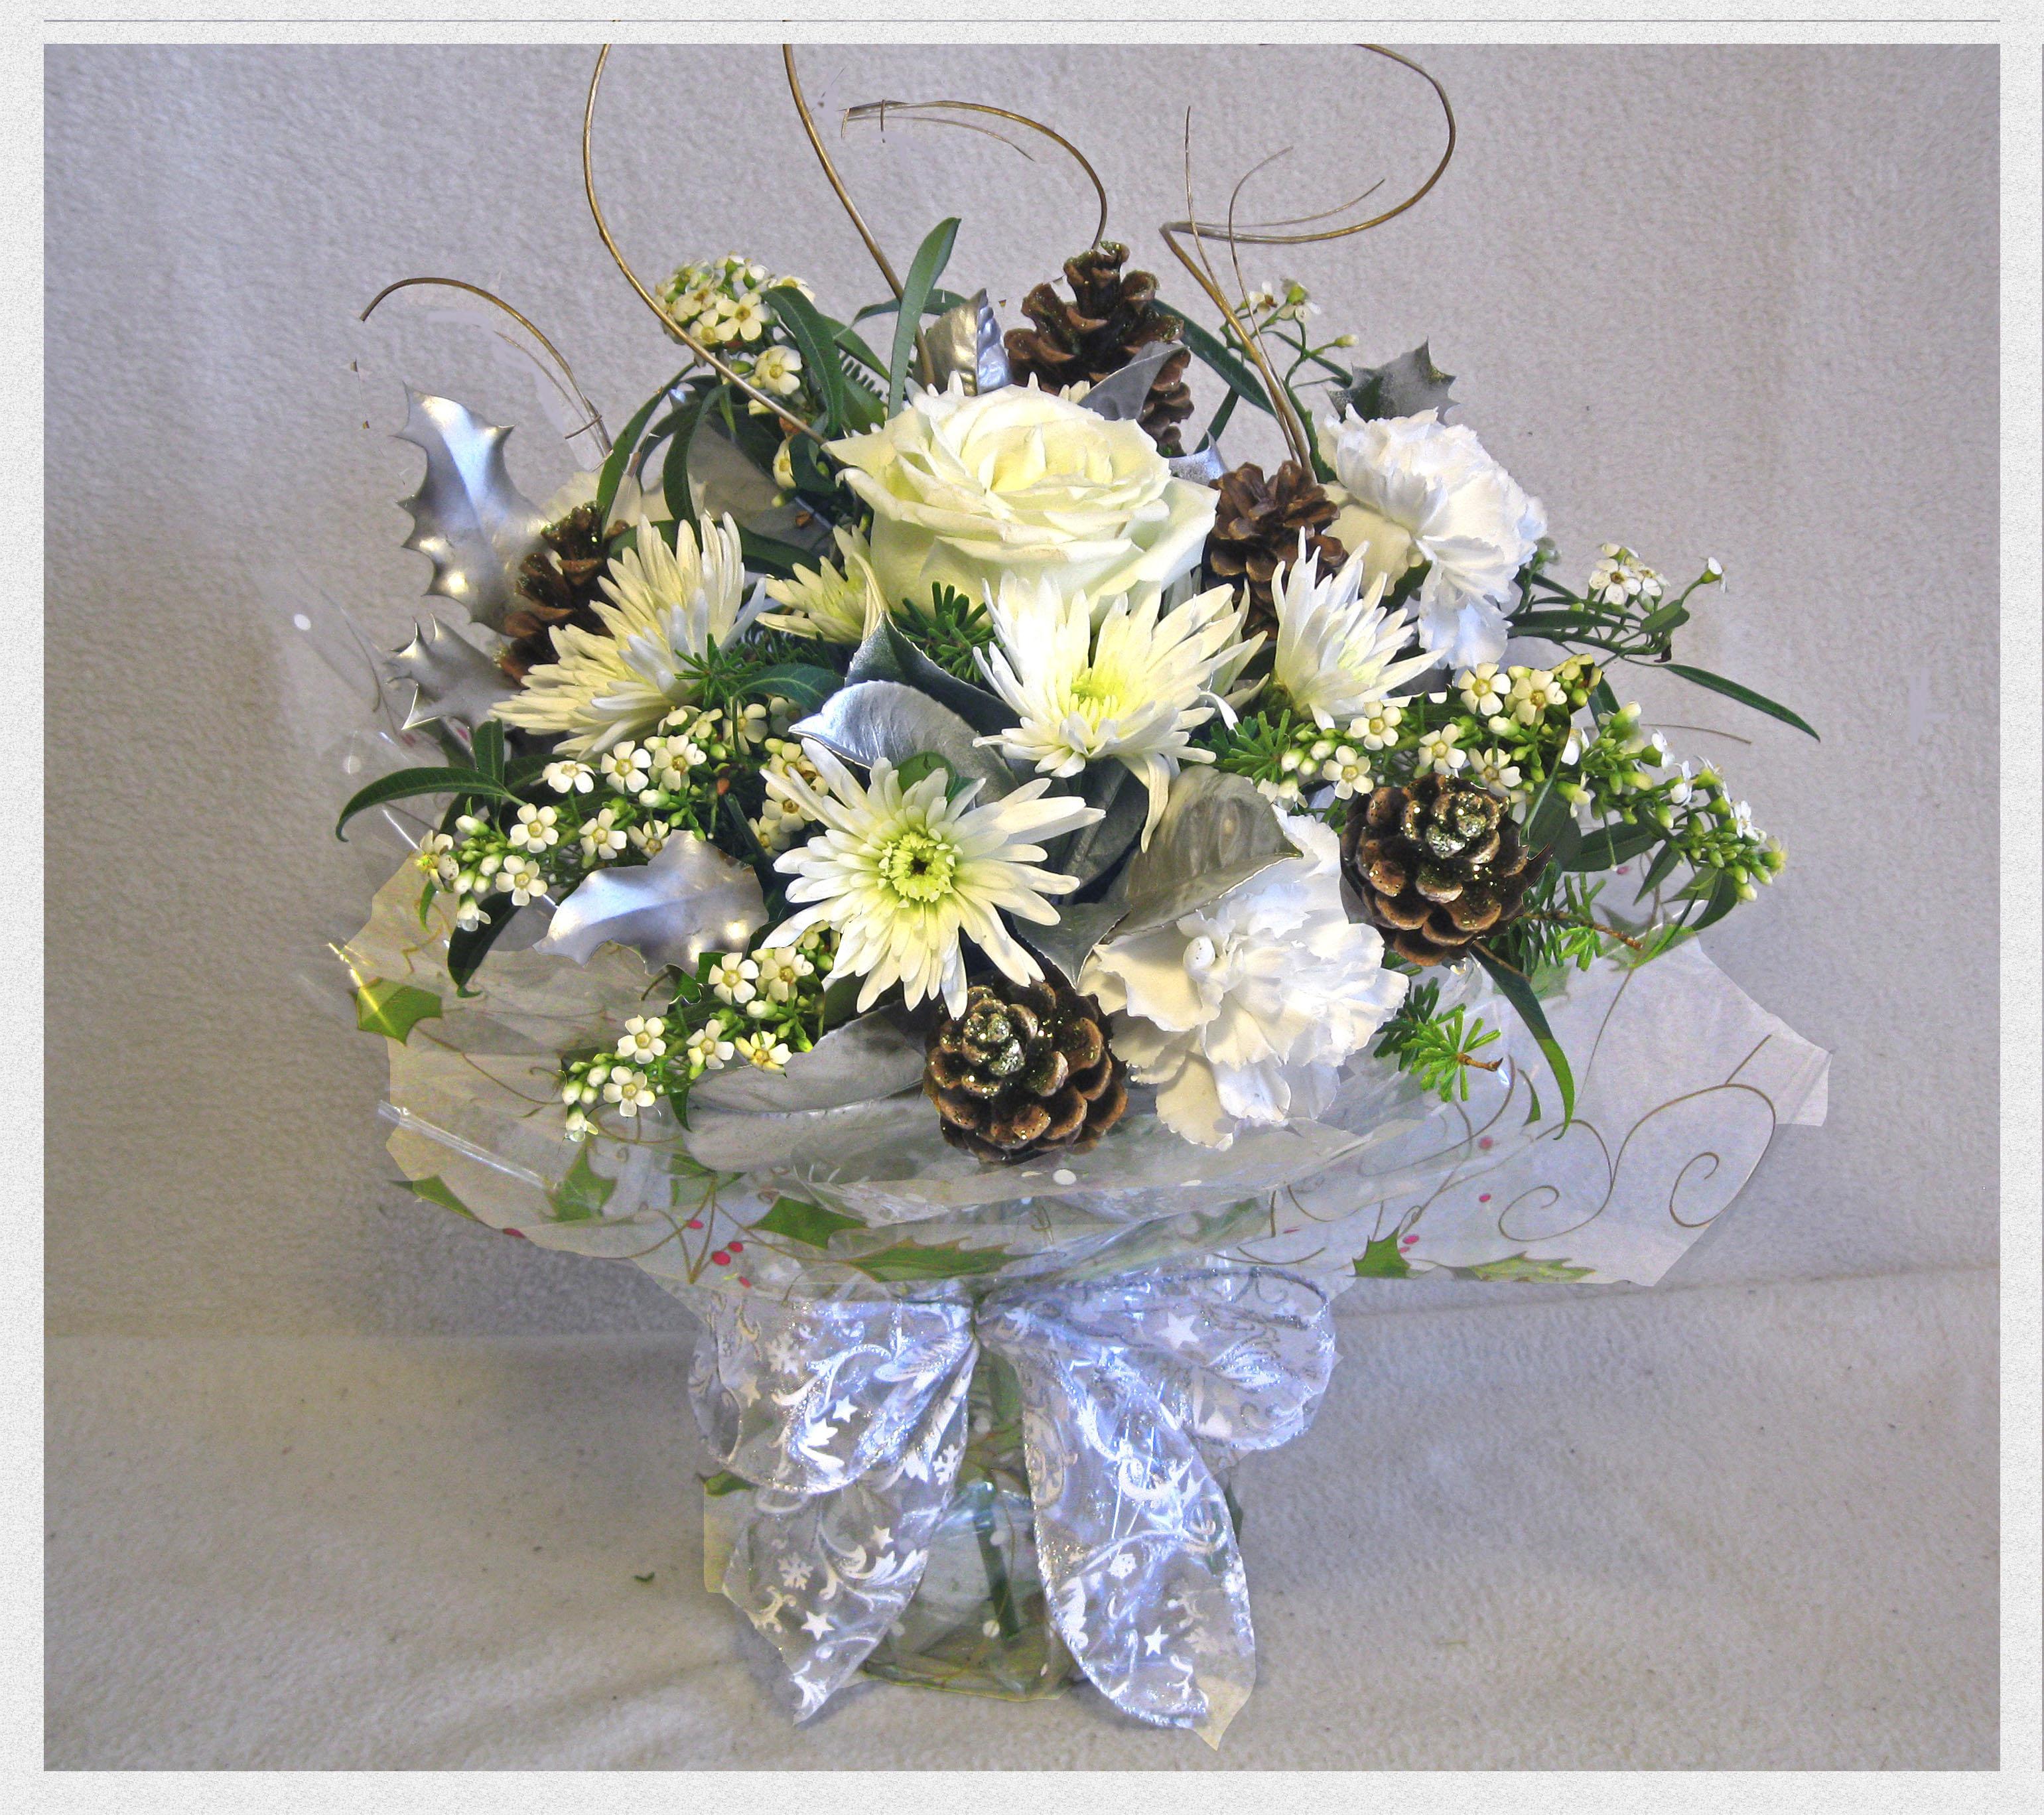 Christmas vase vase flowers white christmas leeds yeadon rawdon christmas vase send flowers leeds florists christmas flower delivery yeadon rawdon mightylinksfo